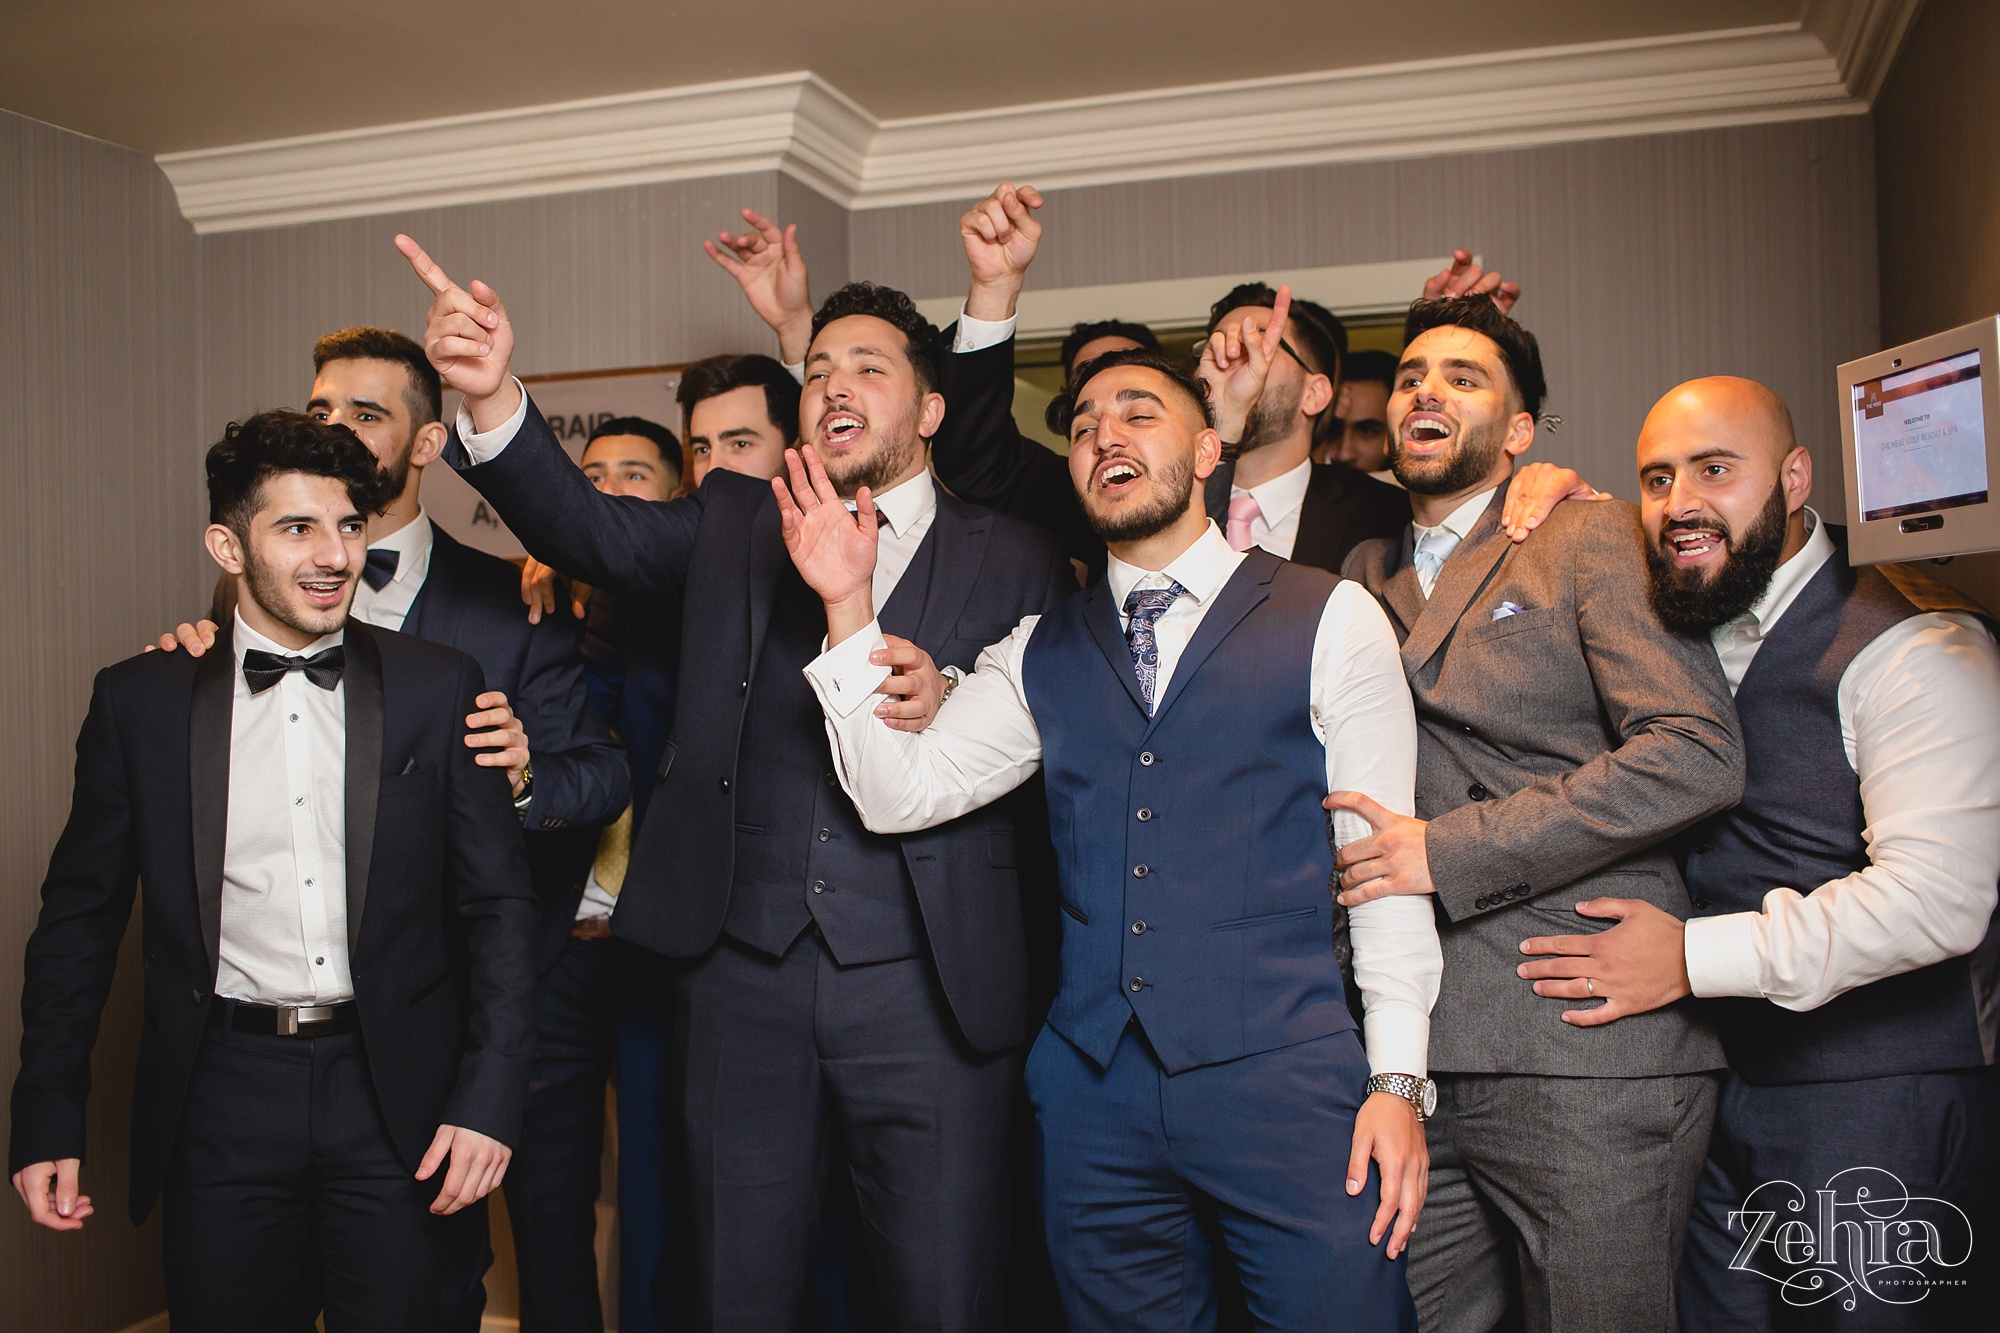 zehra photographer mere cheshire wedding_0072.jpg